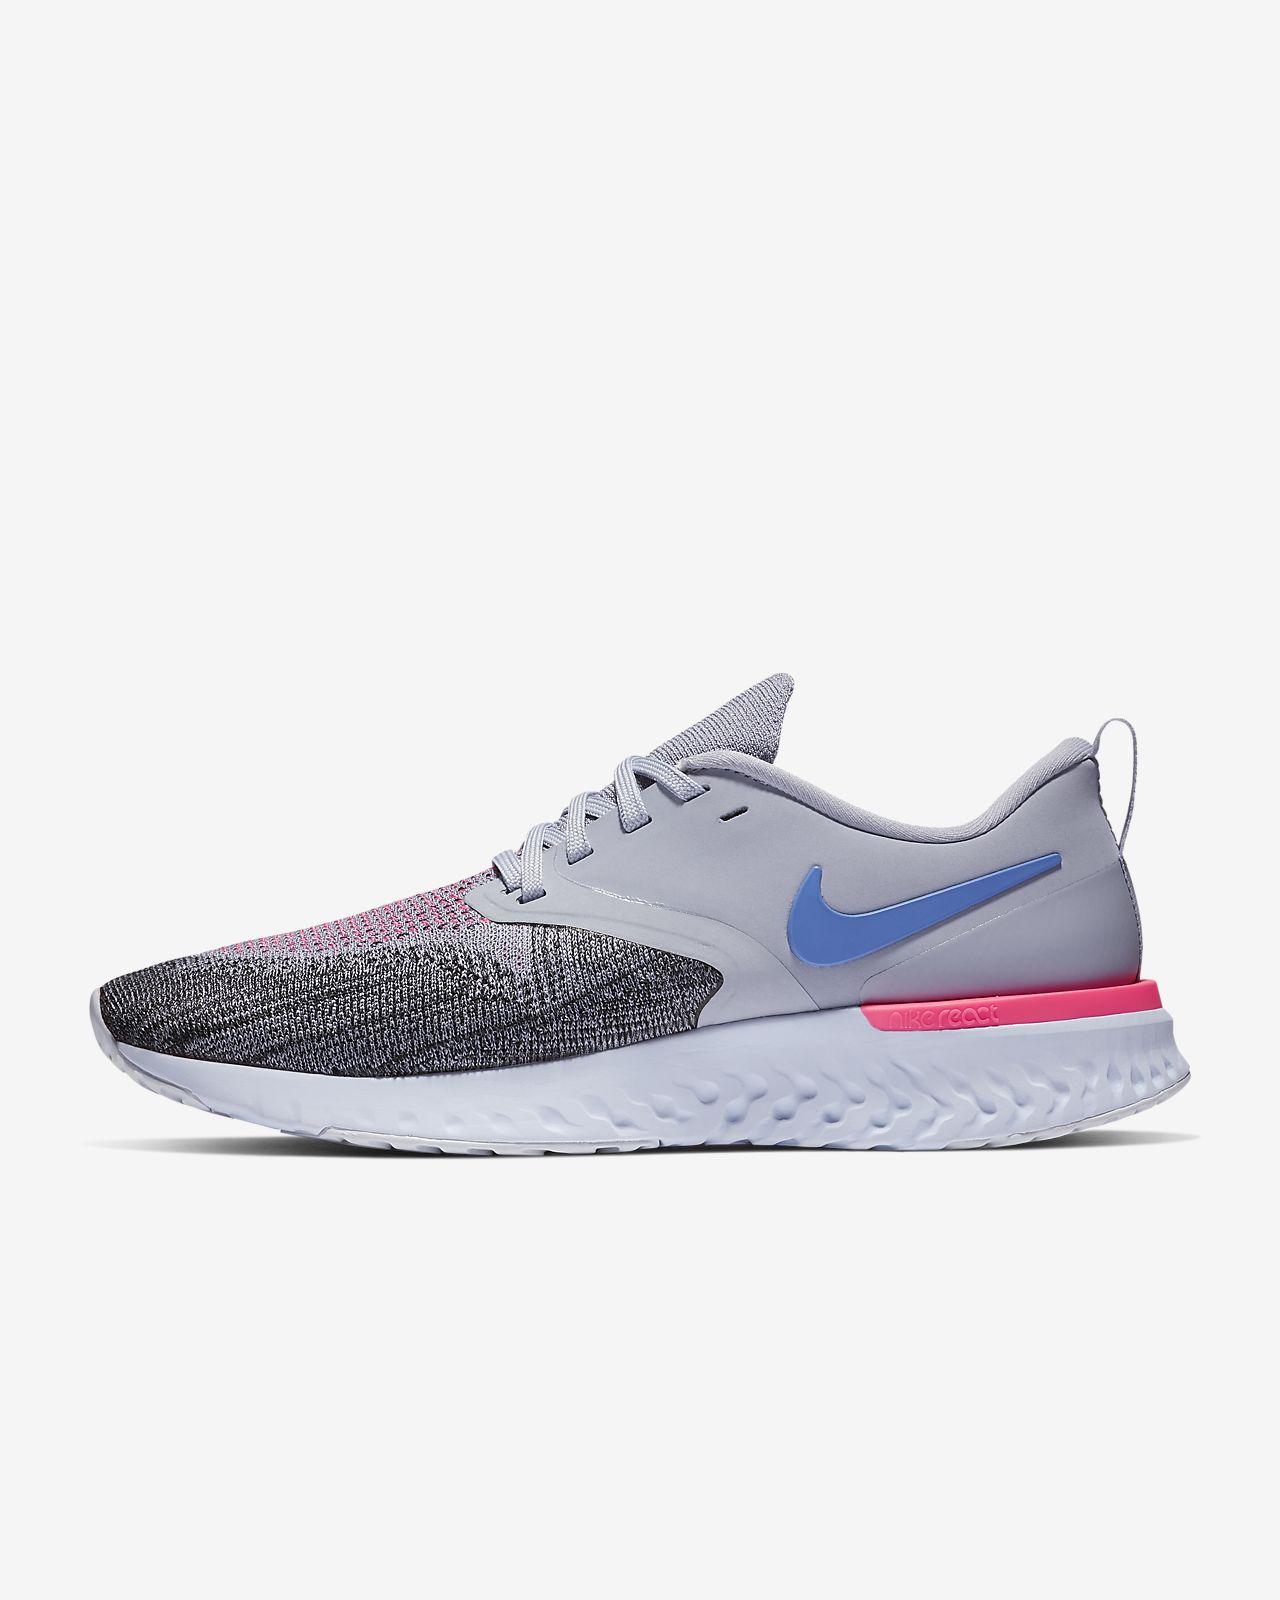 bb52431fefff4 Nike Odyssey React Flyknit 2 Zapatillas de running - Mujer. Nike.com ES